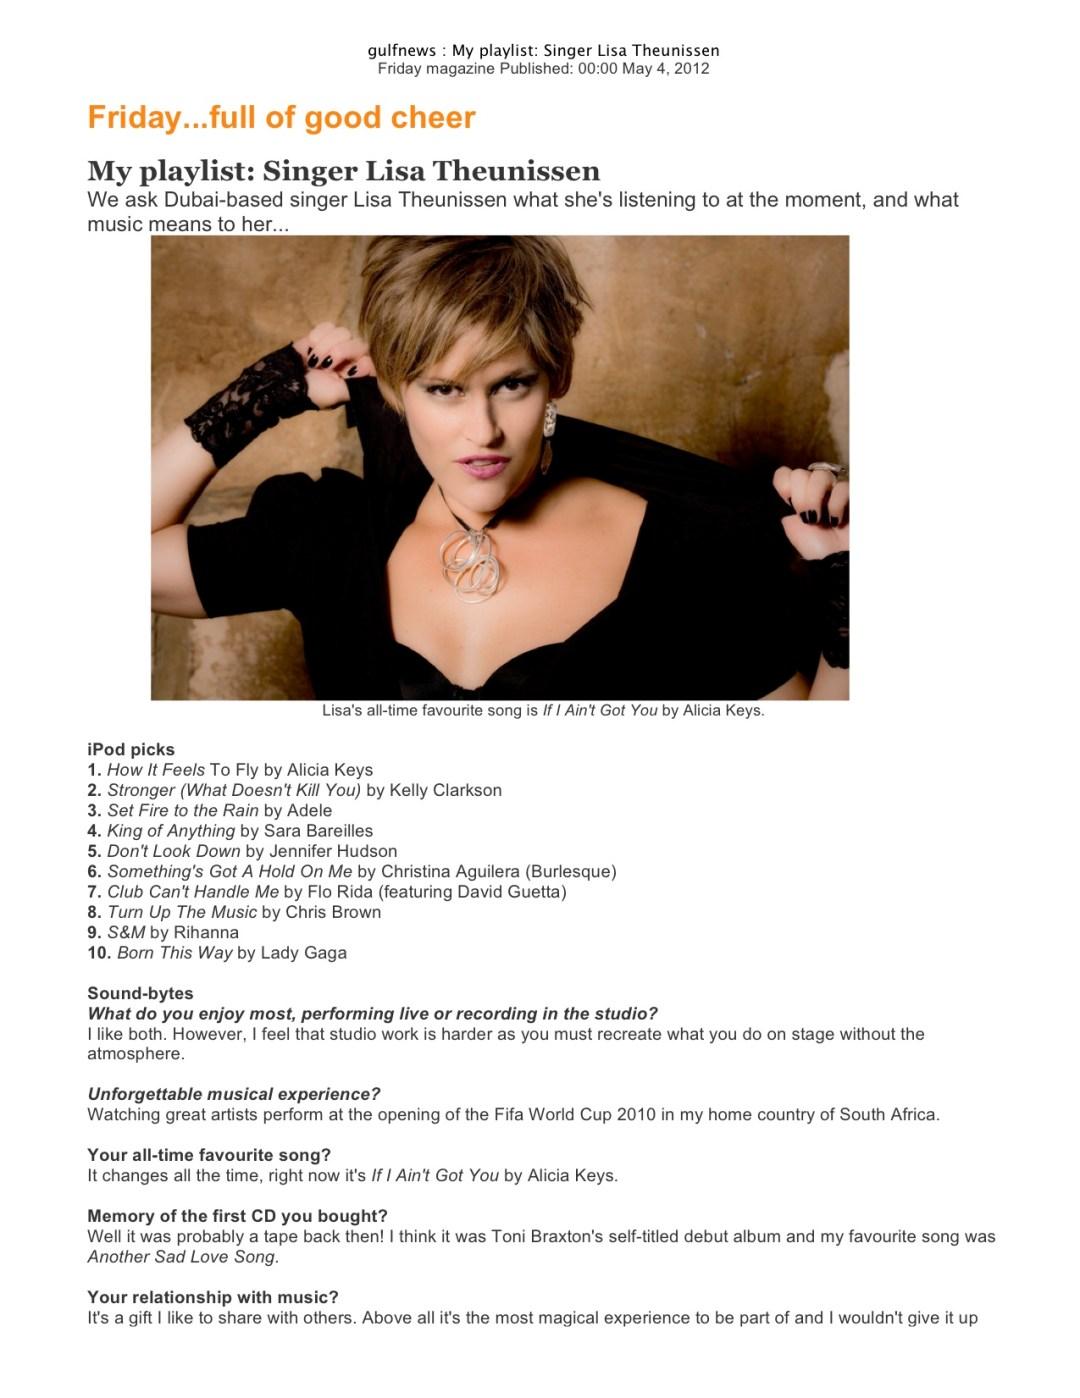 The Fridge - Gulf News Interview Press Release, Dubai 2012